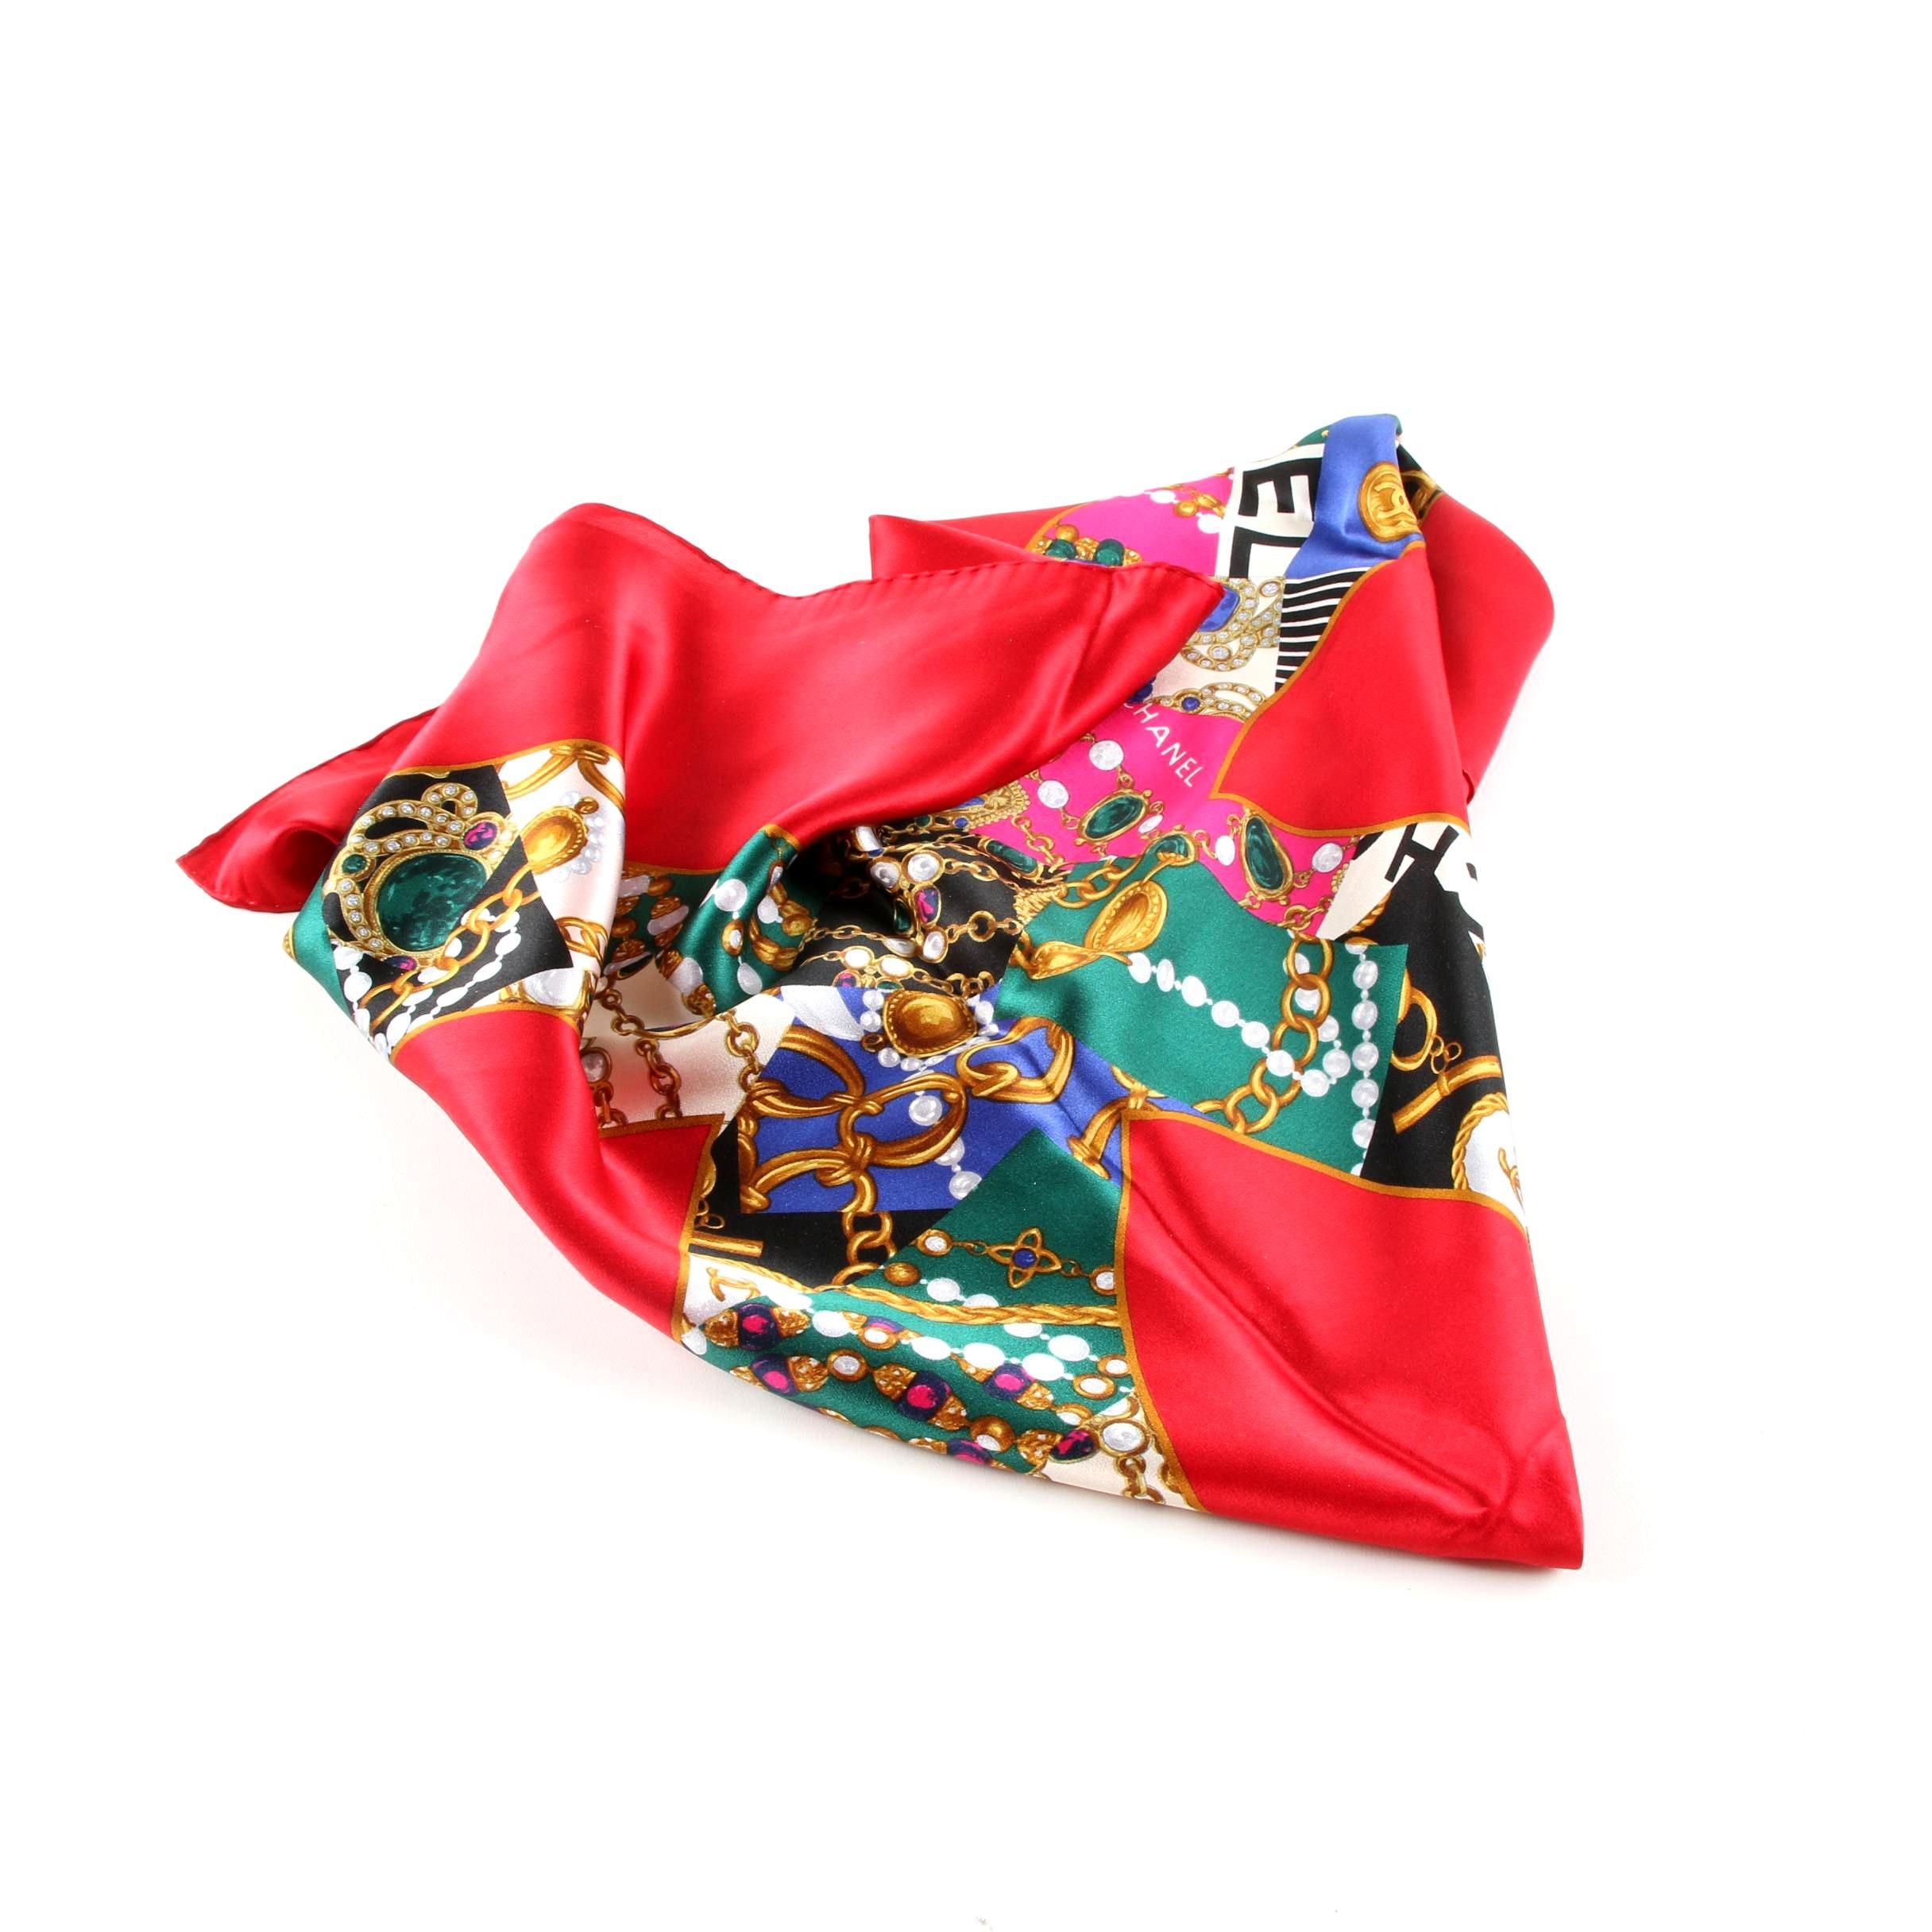 Circa 1980 Chanel Red Silk Scarf